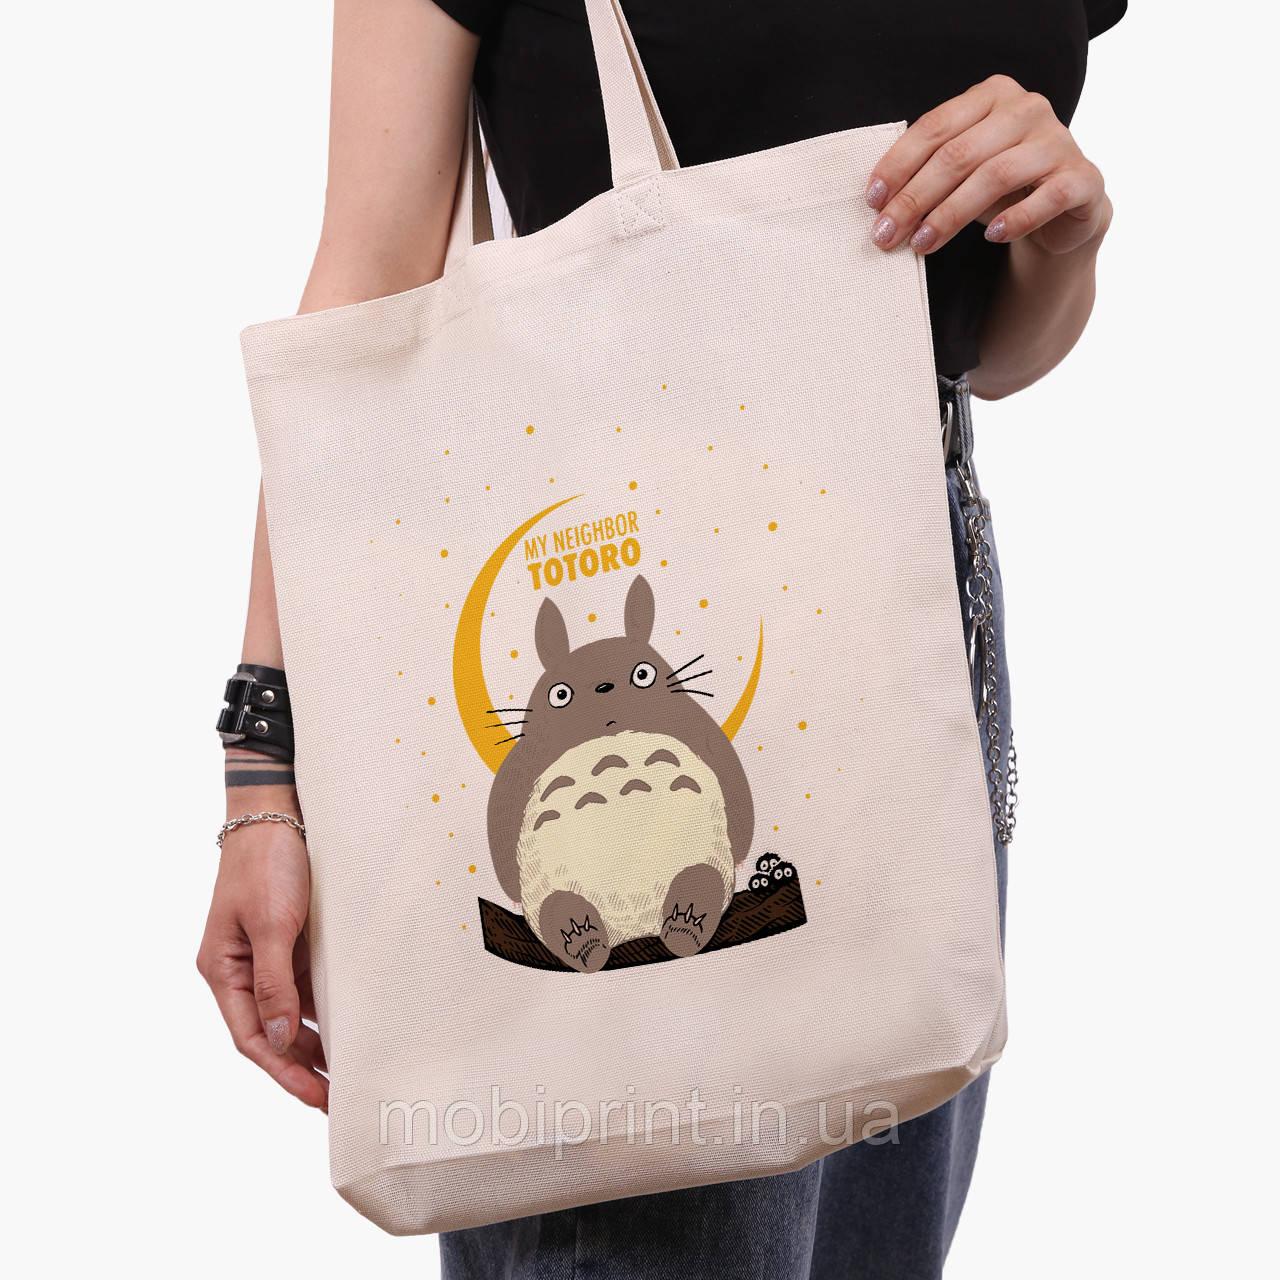 Эко сумка шоппер белая Мой сосед Тоторо (My Neighbor Totoro) (9227-2657-1)  41*39*8 см